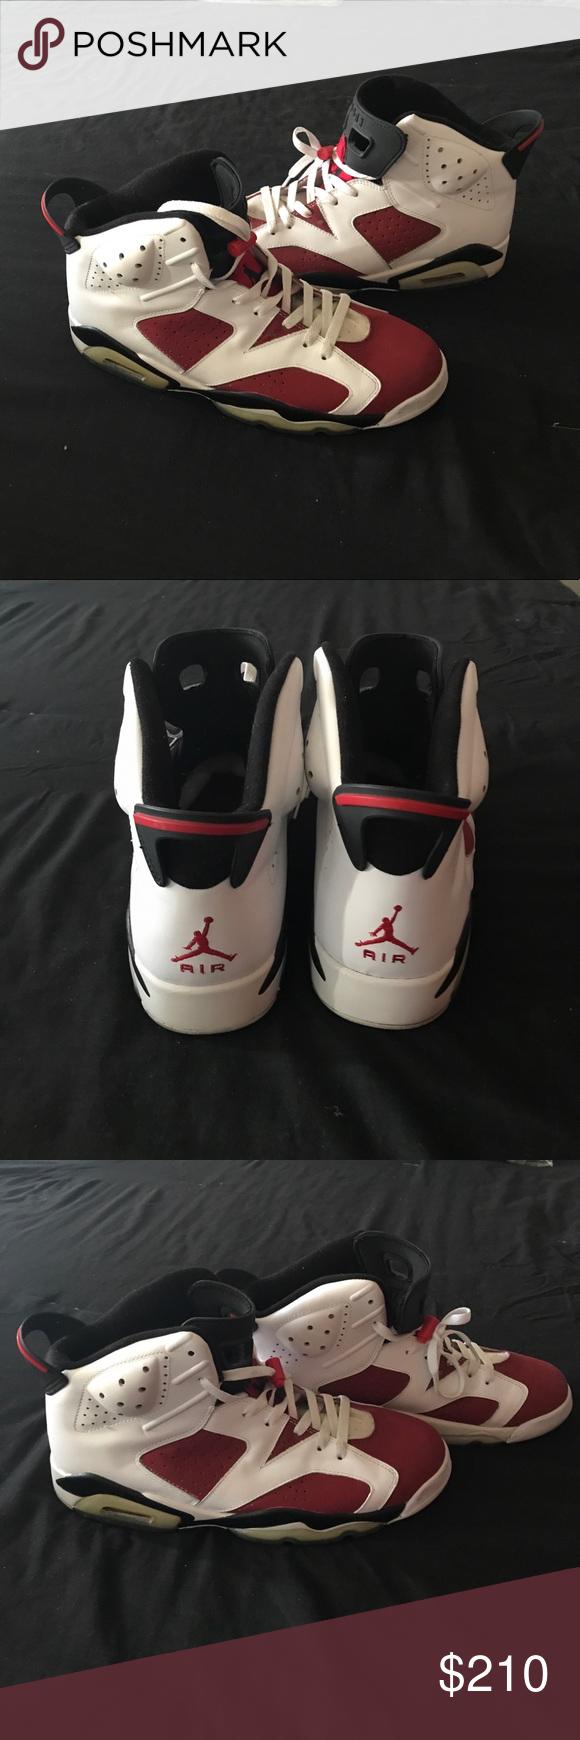 new product fe02e 26773 Men s Nike Air Jordan Retro 6 White Carmine-Black My cousin got these for